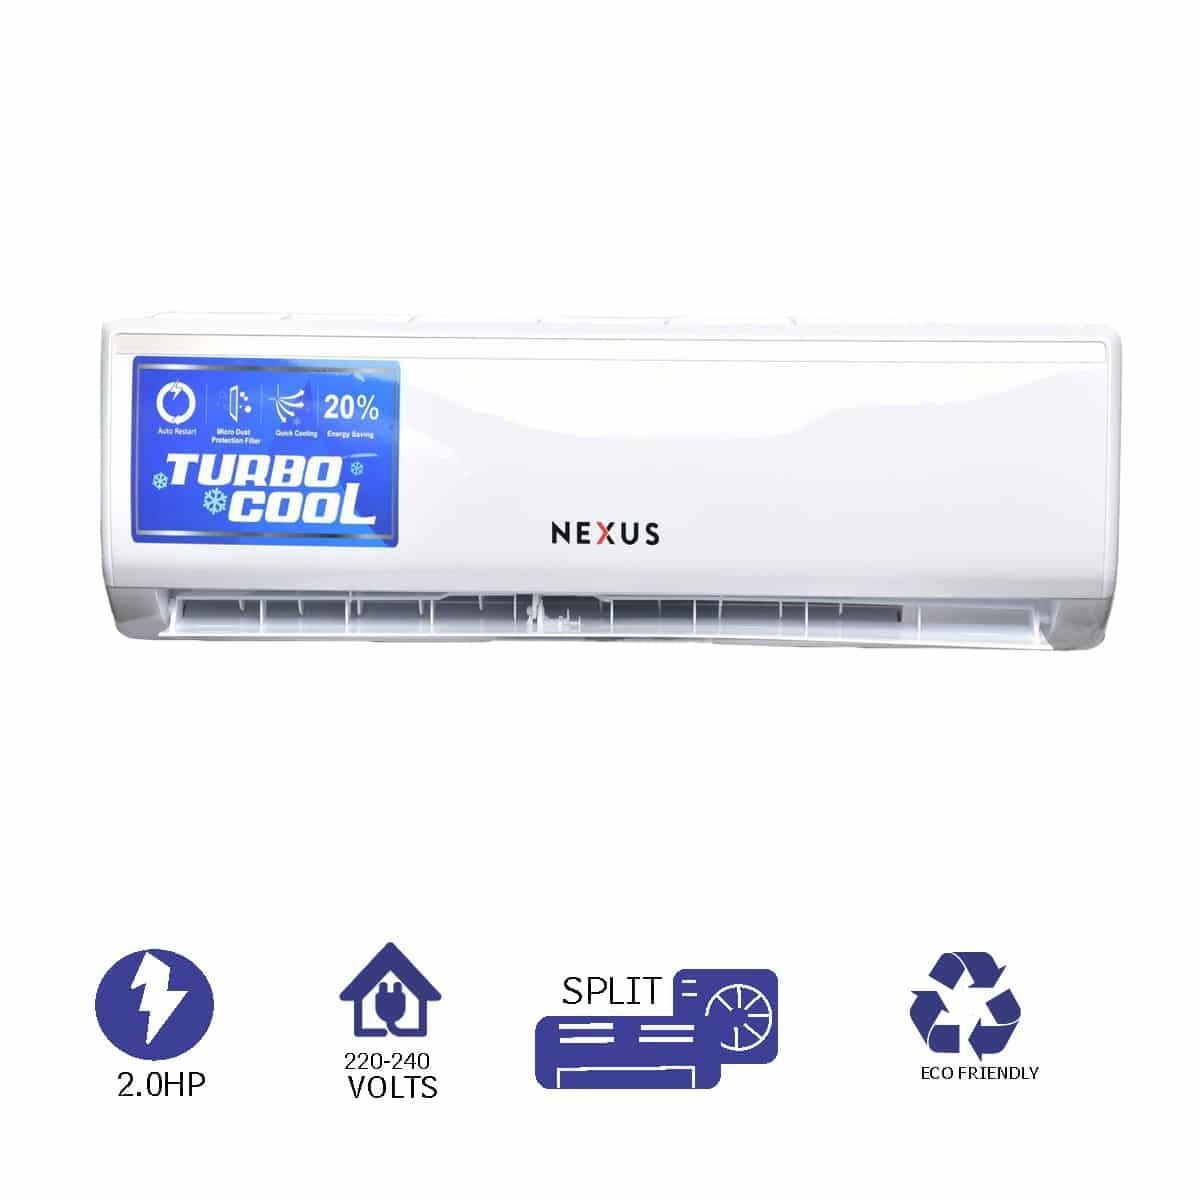 nexus airconditioner